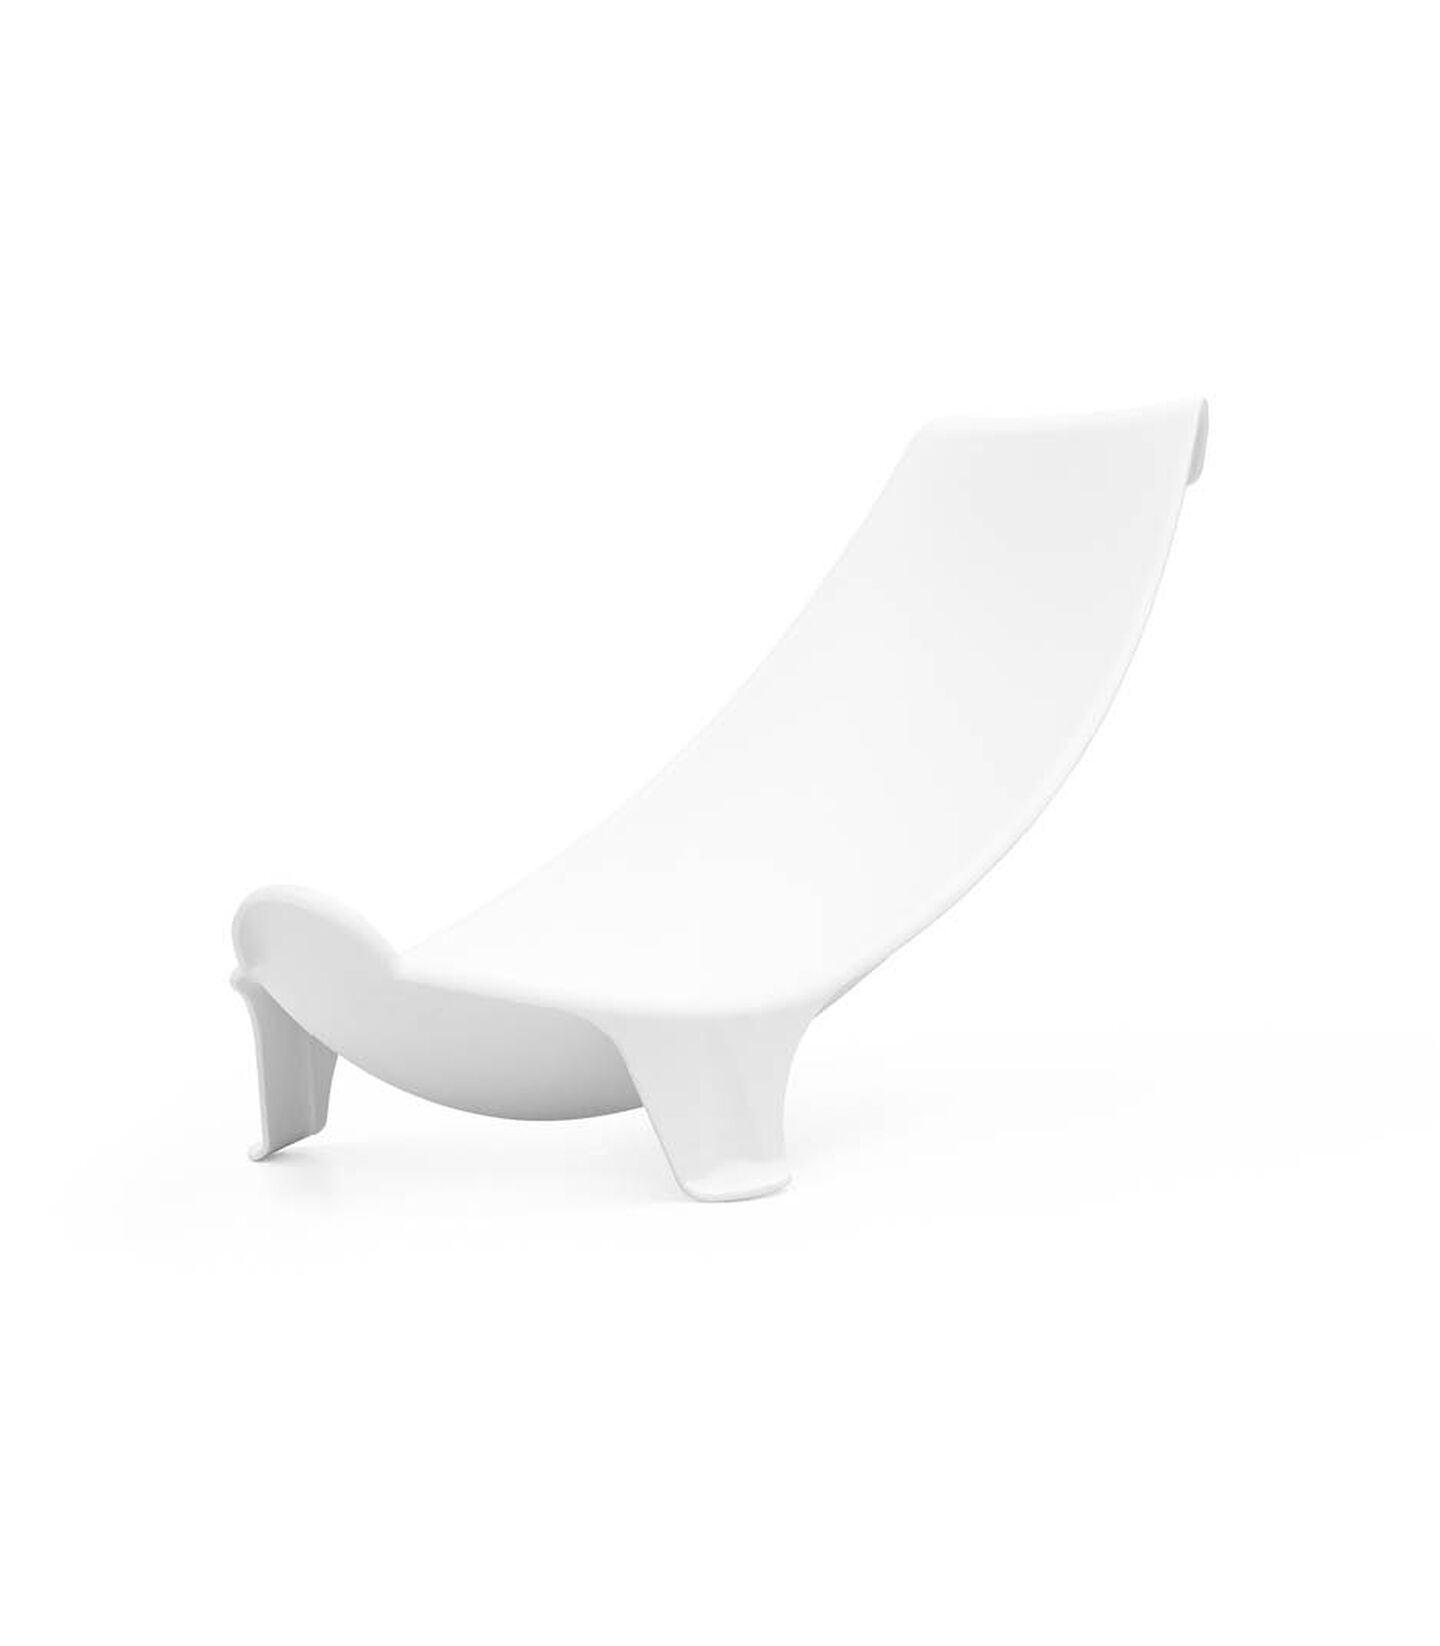 Stokke® Flexi Bath® Newborn Support, , mainview